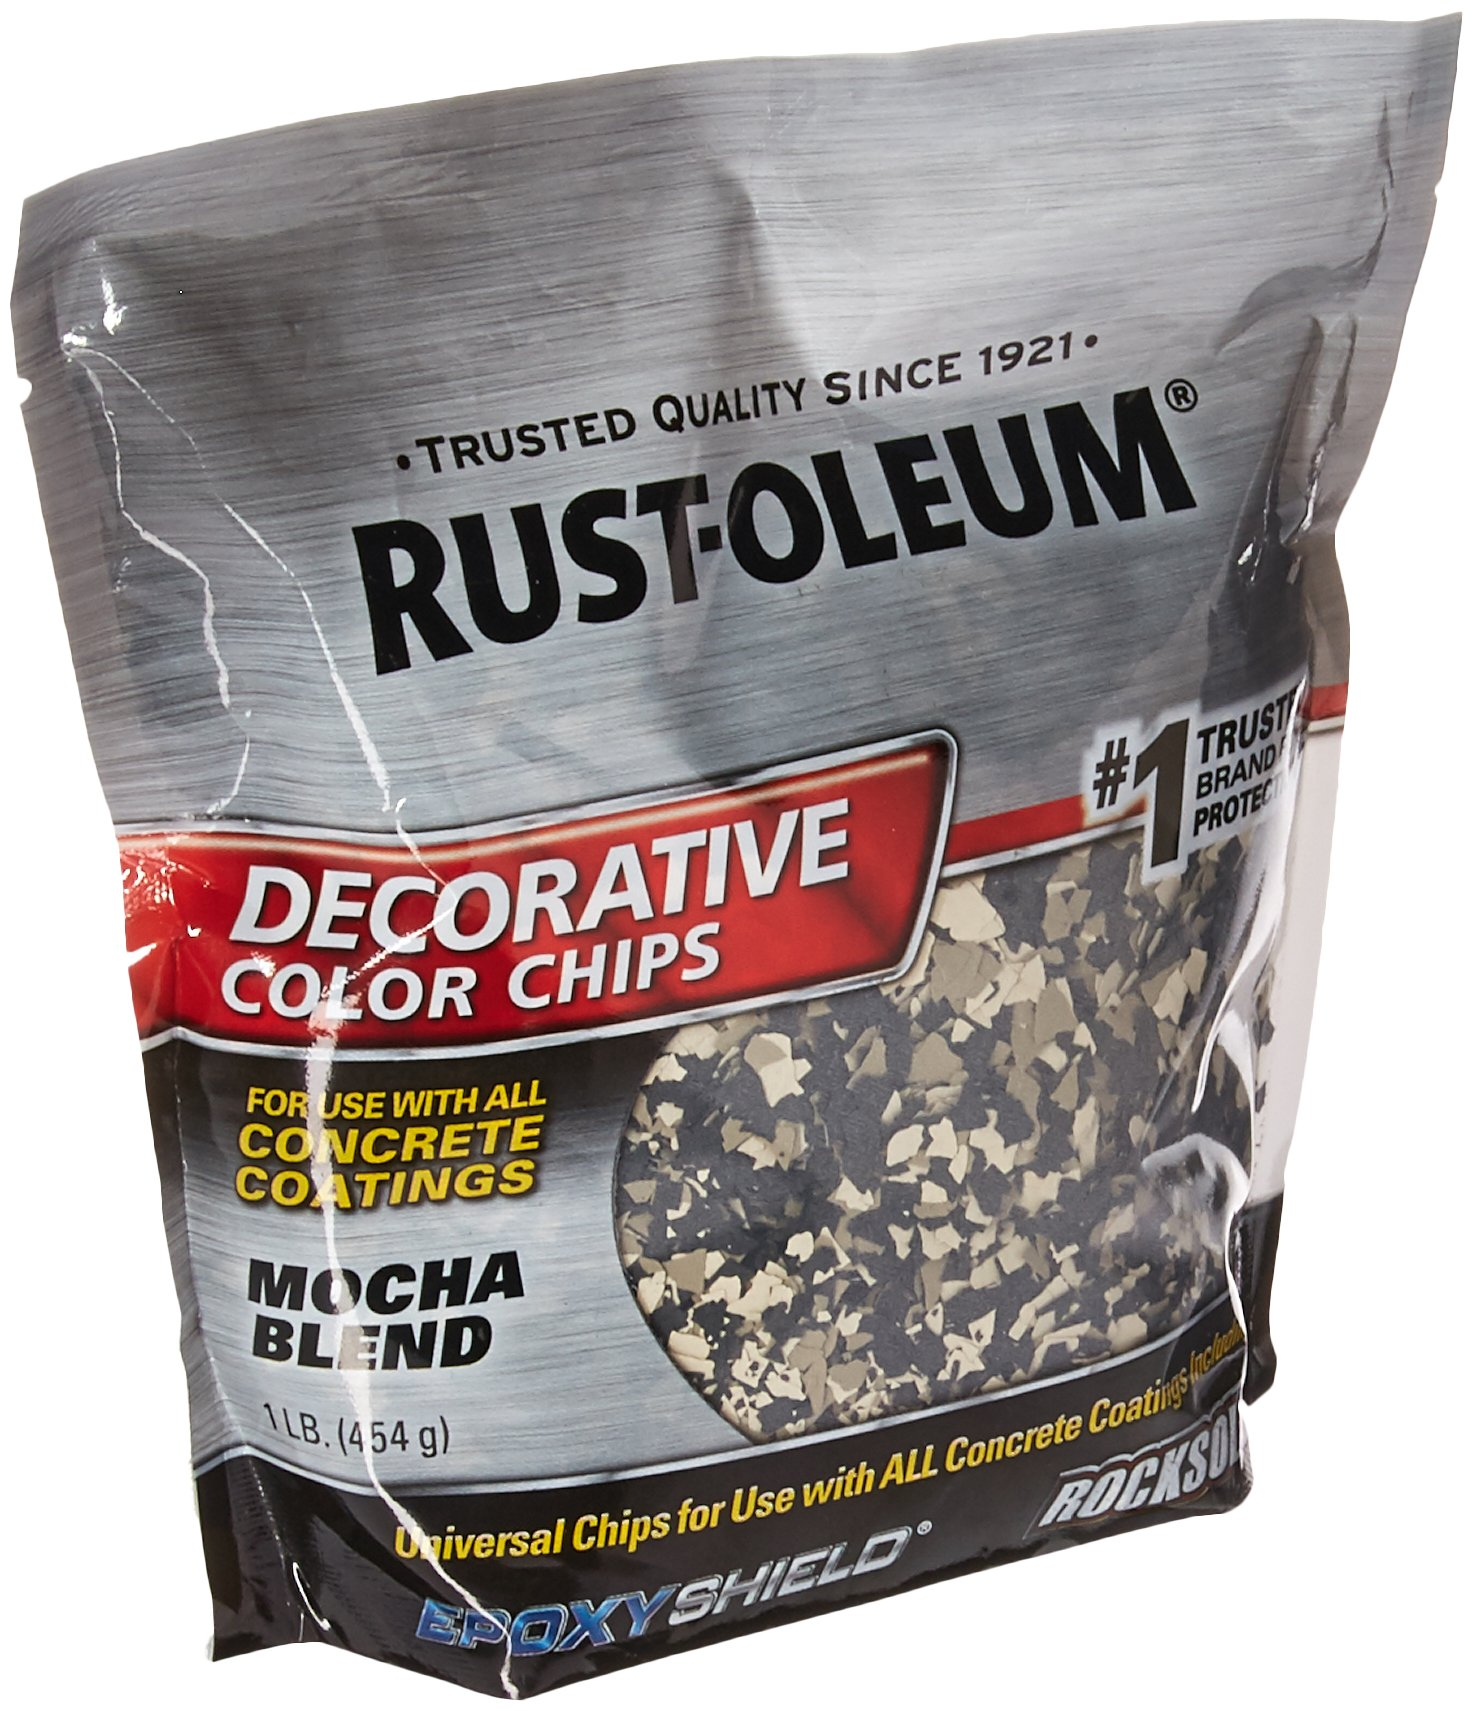 Rust-Oleum 301238 Decorative Color Chips, Mocha Blend